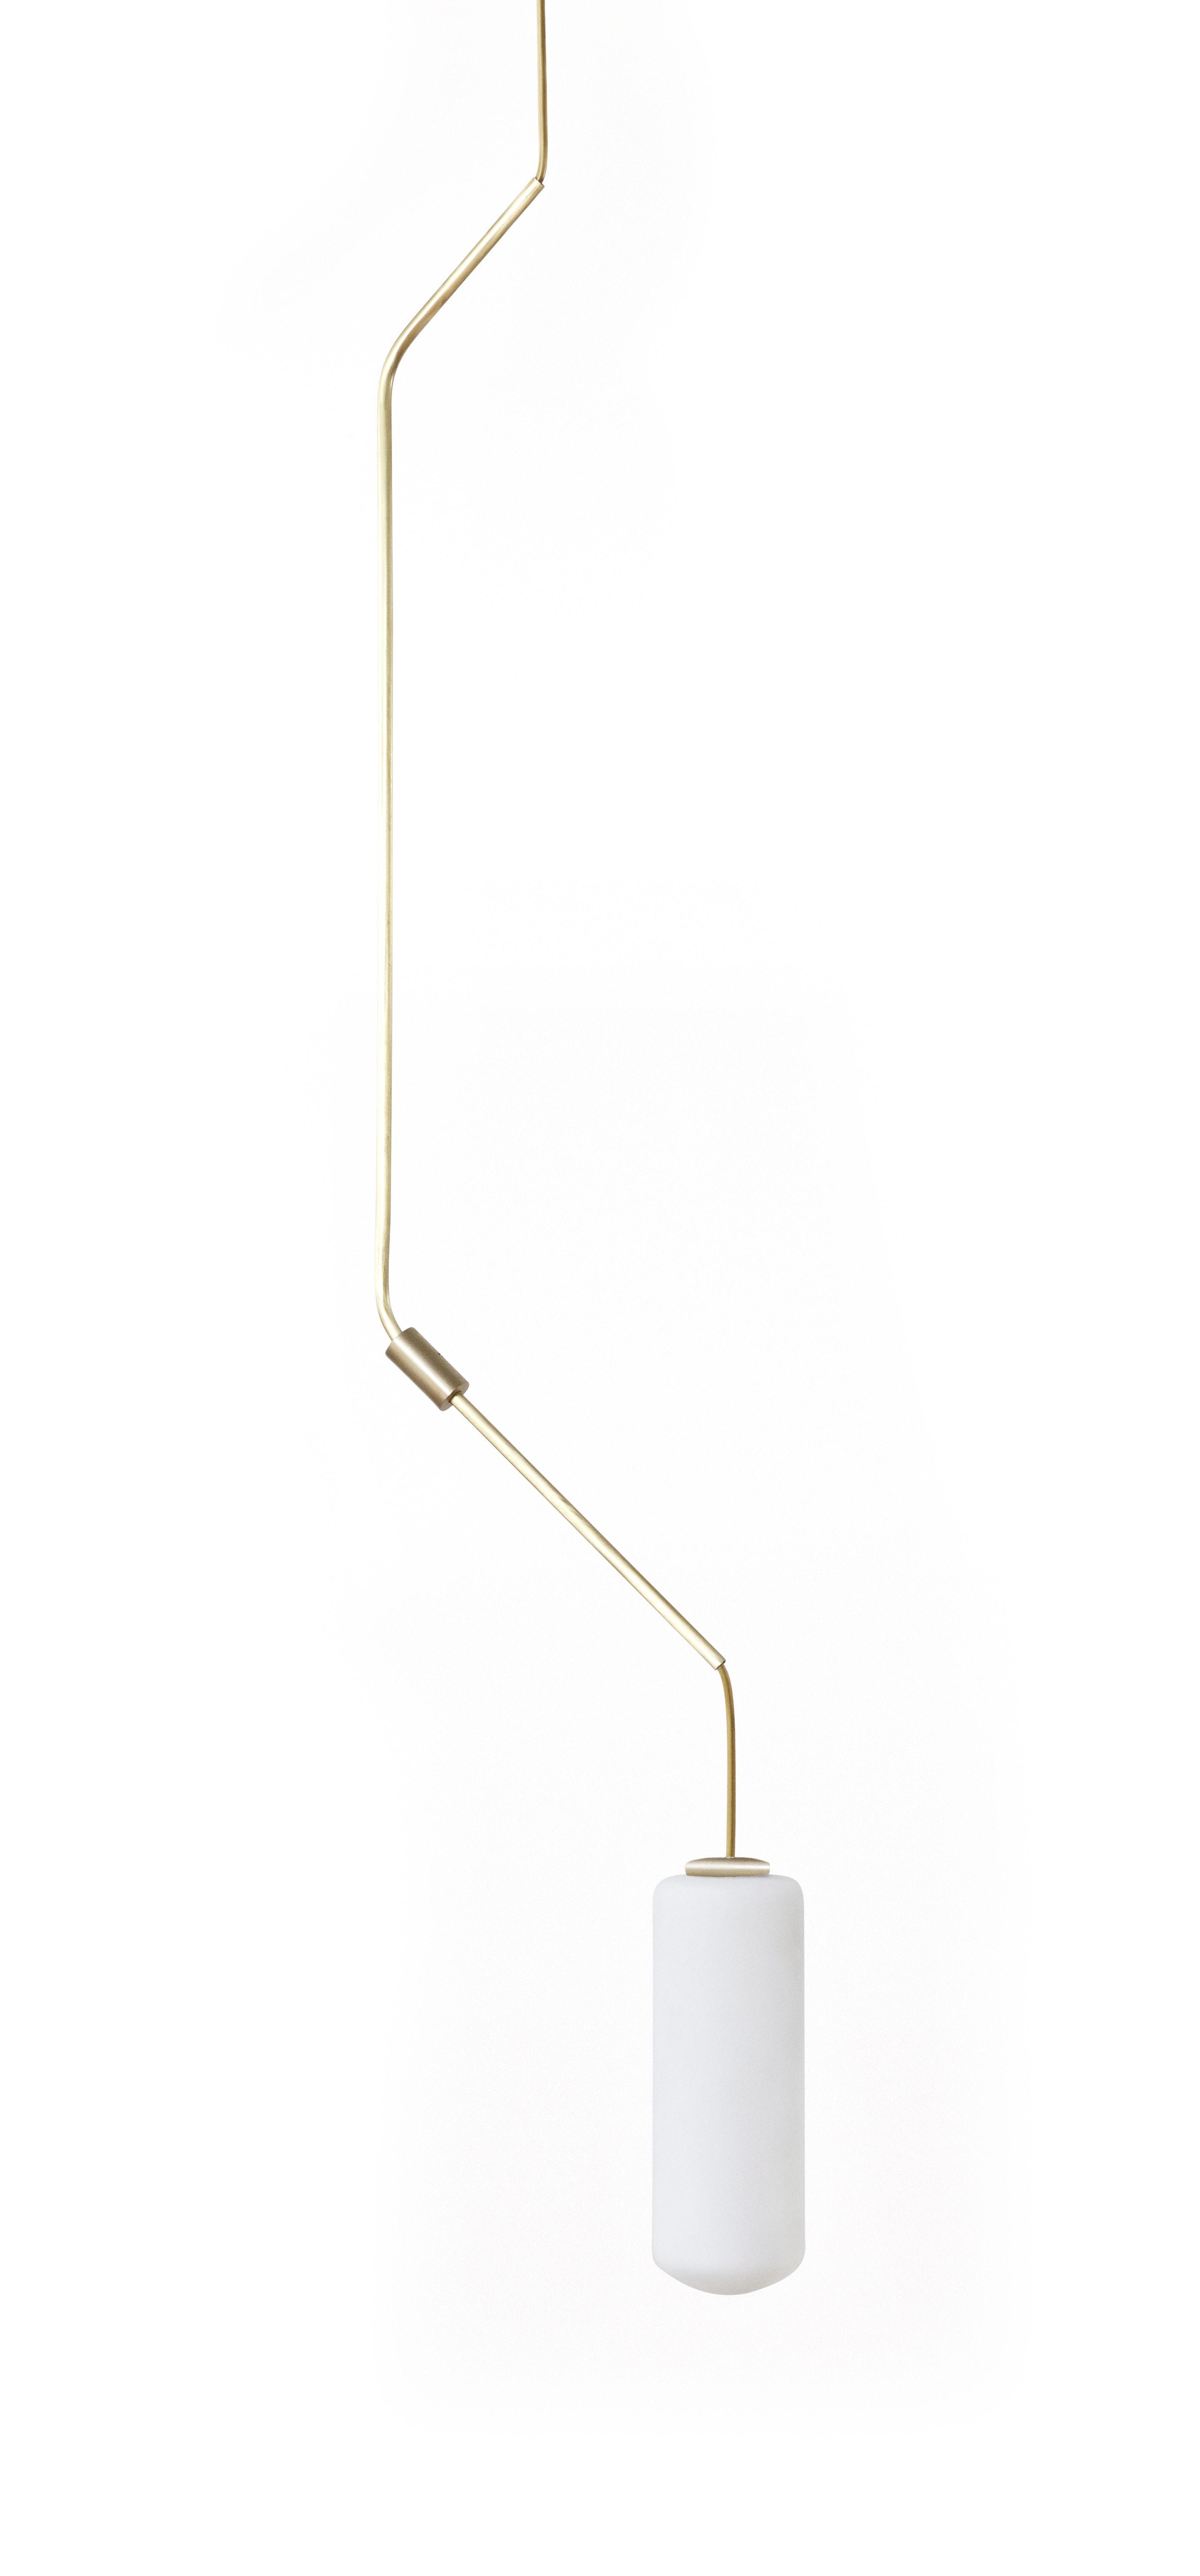 Leuchten - Pendelleuchten - Ventus n°2 - H 132 cm Pendelleuchte / Glas & Messing - Frama  - Nr. 2 / Messing - Messing, Opalglas